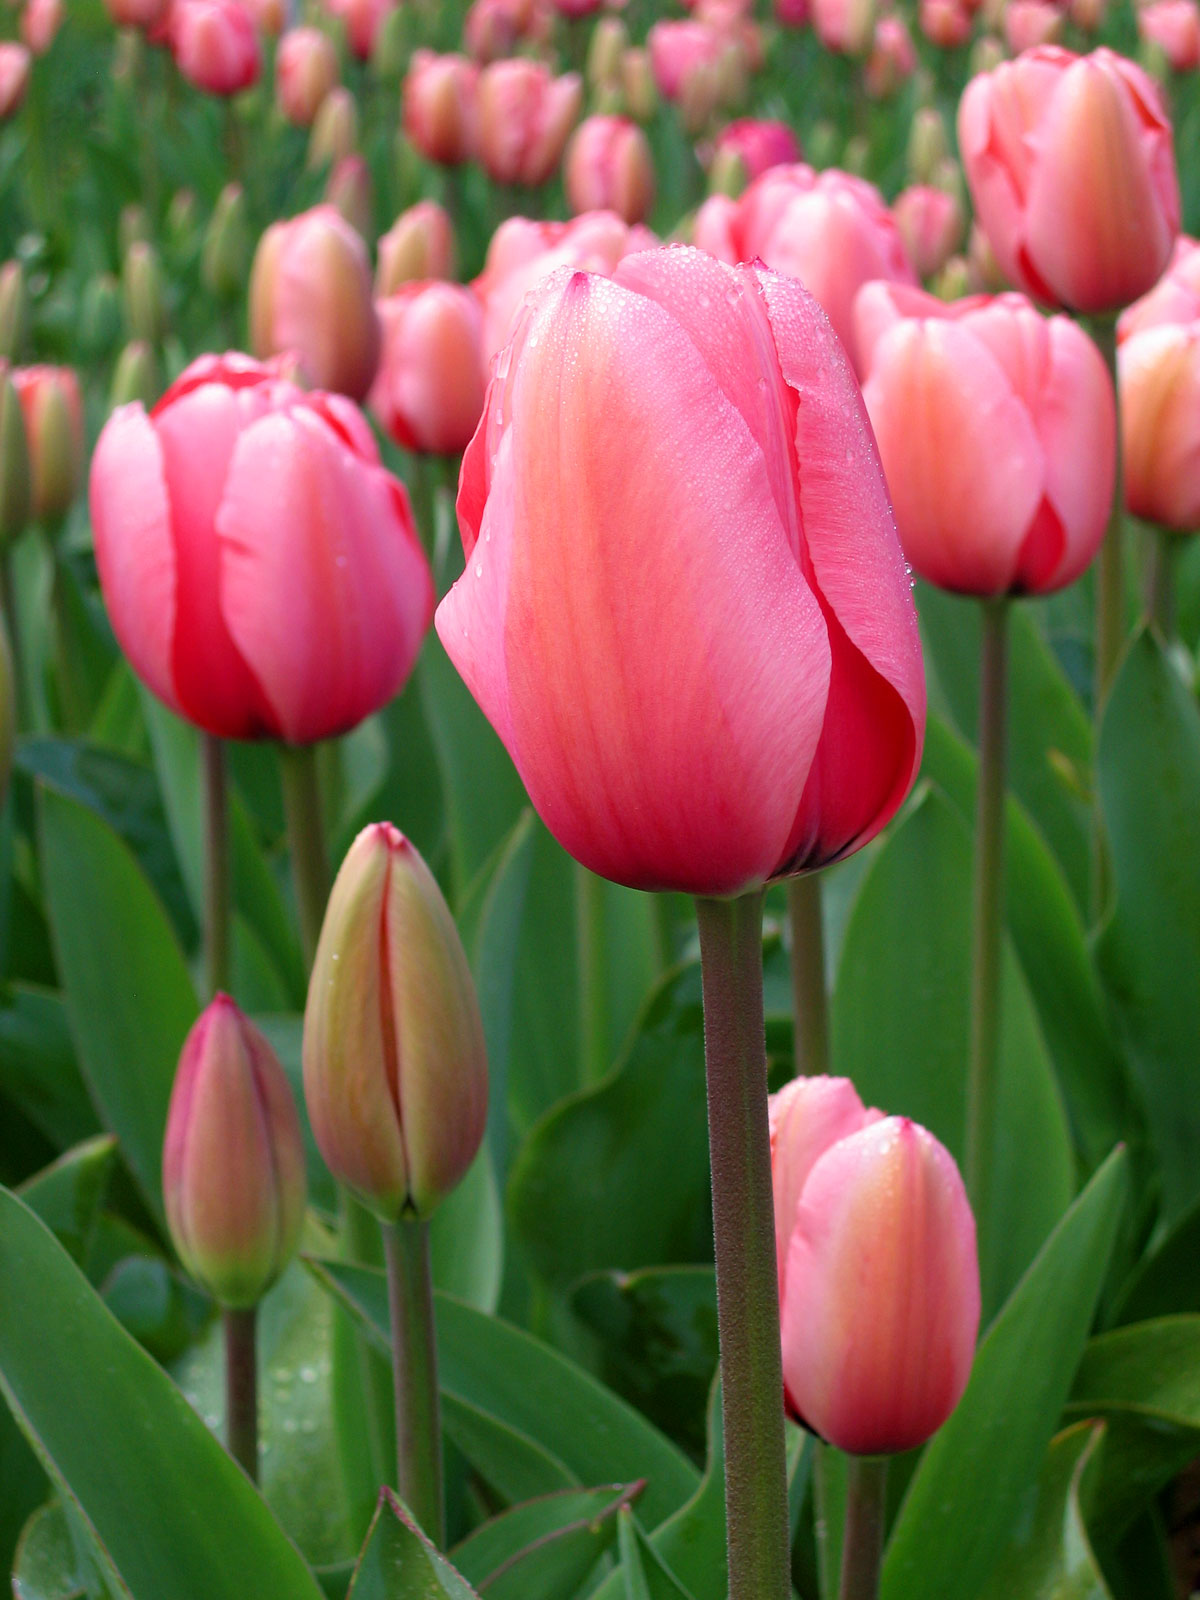 Tulips, Canberra; photo by John O'Neill